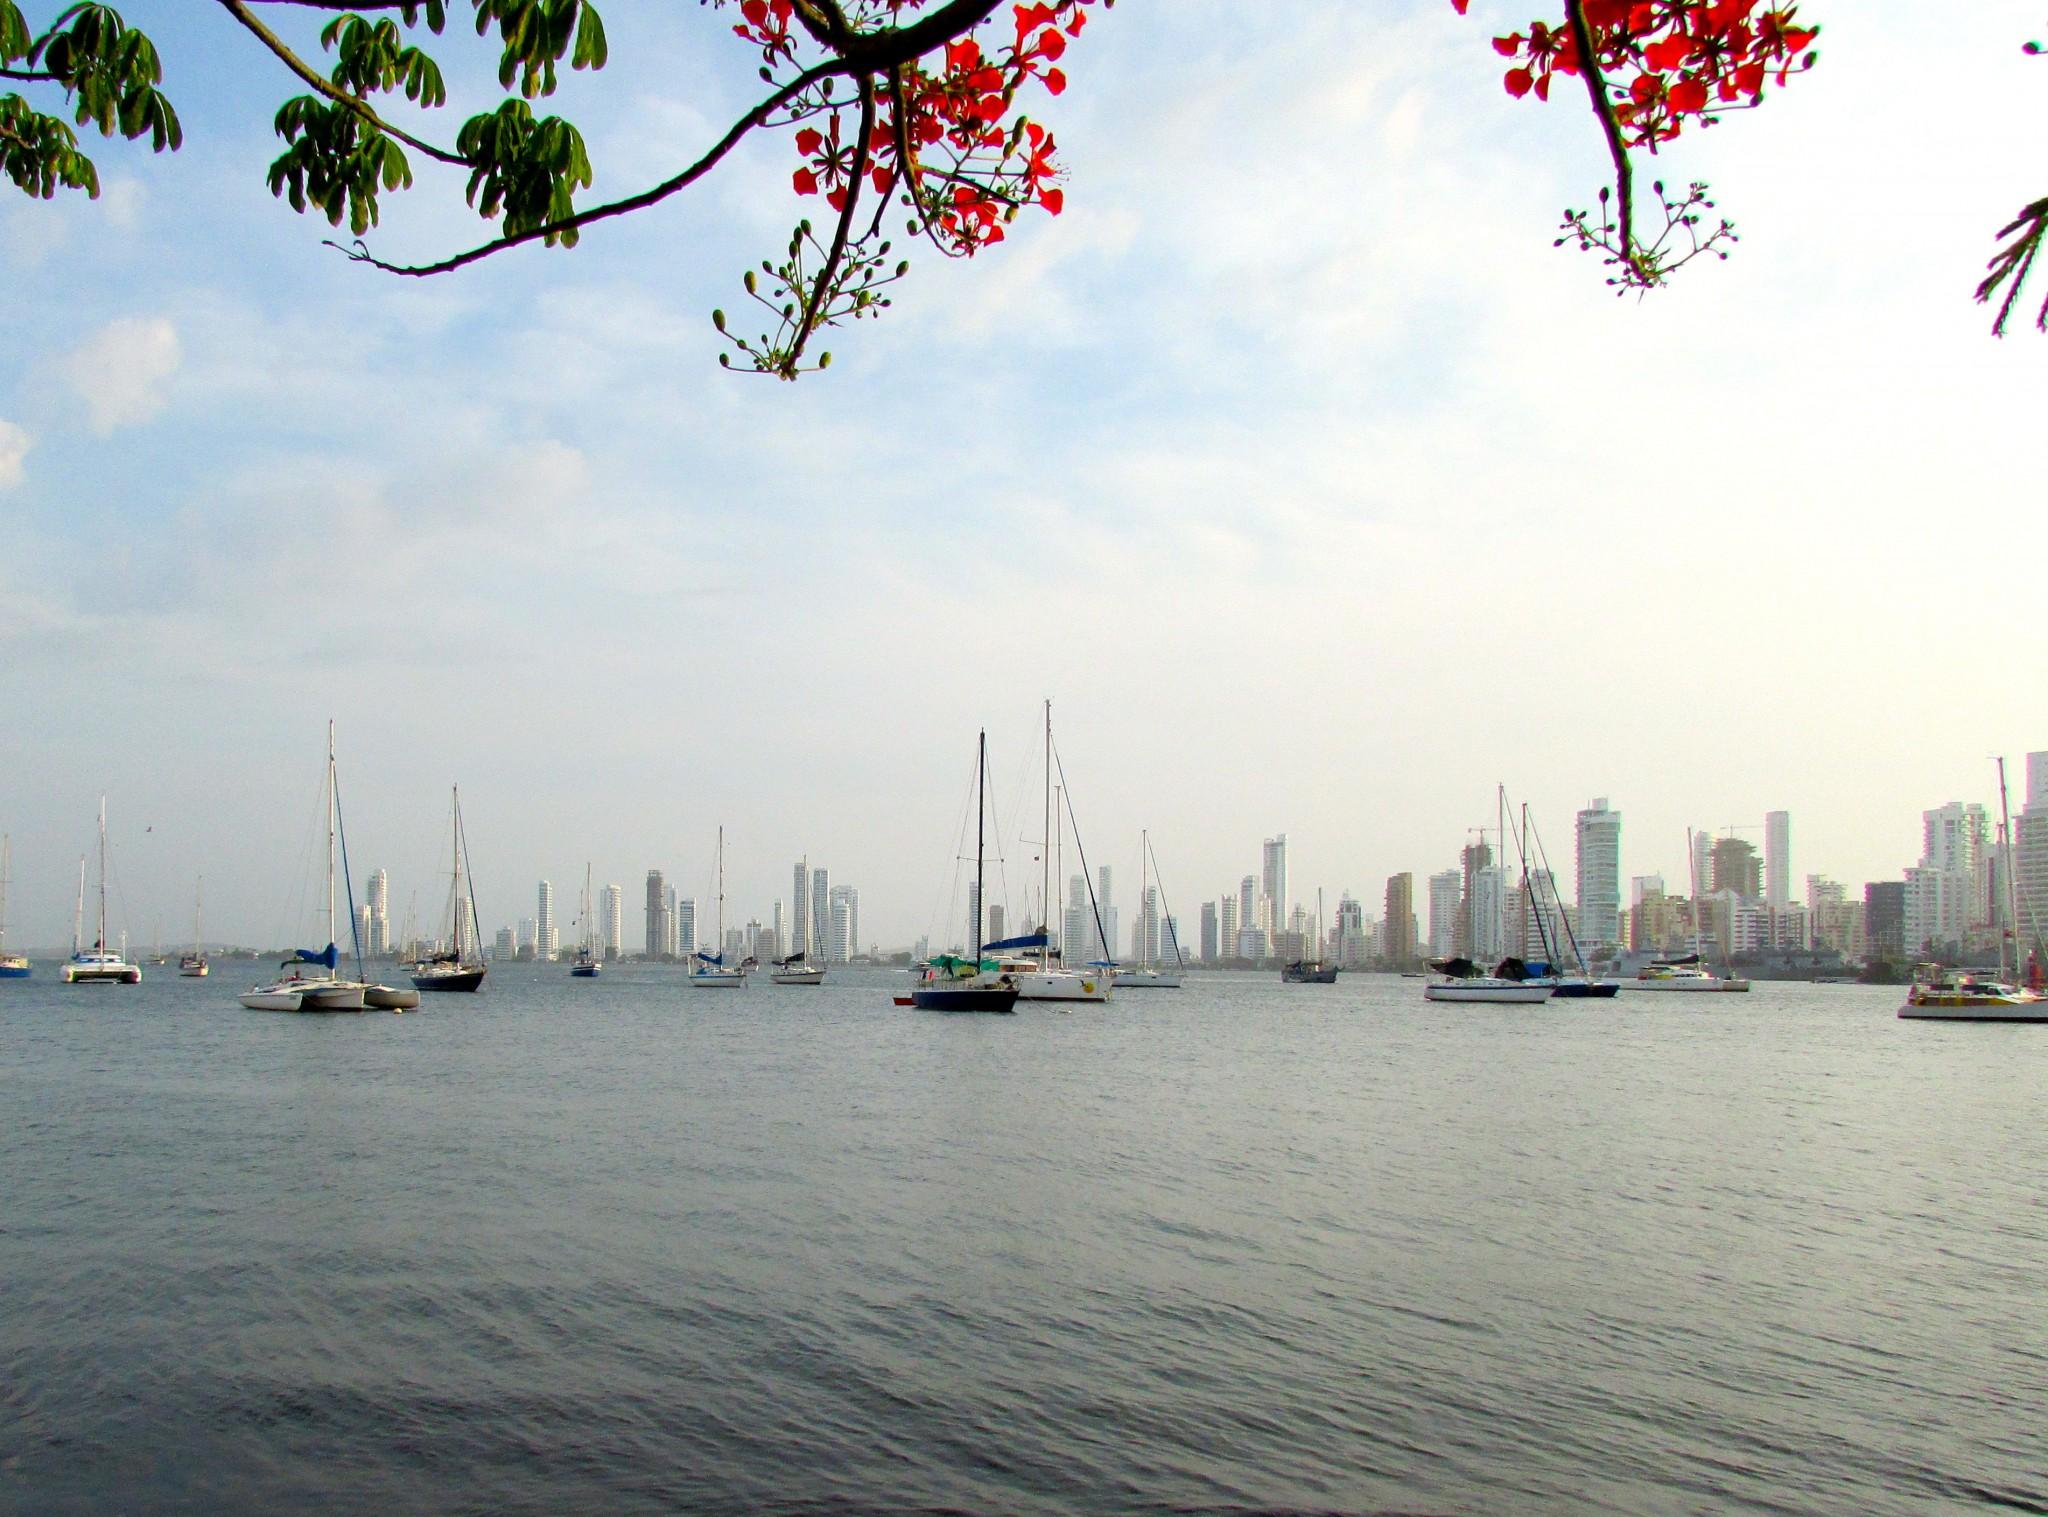 Cartagena waterfront